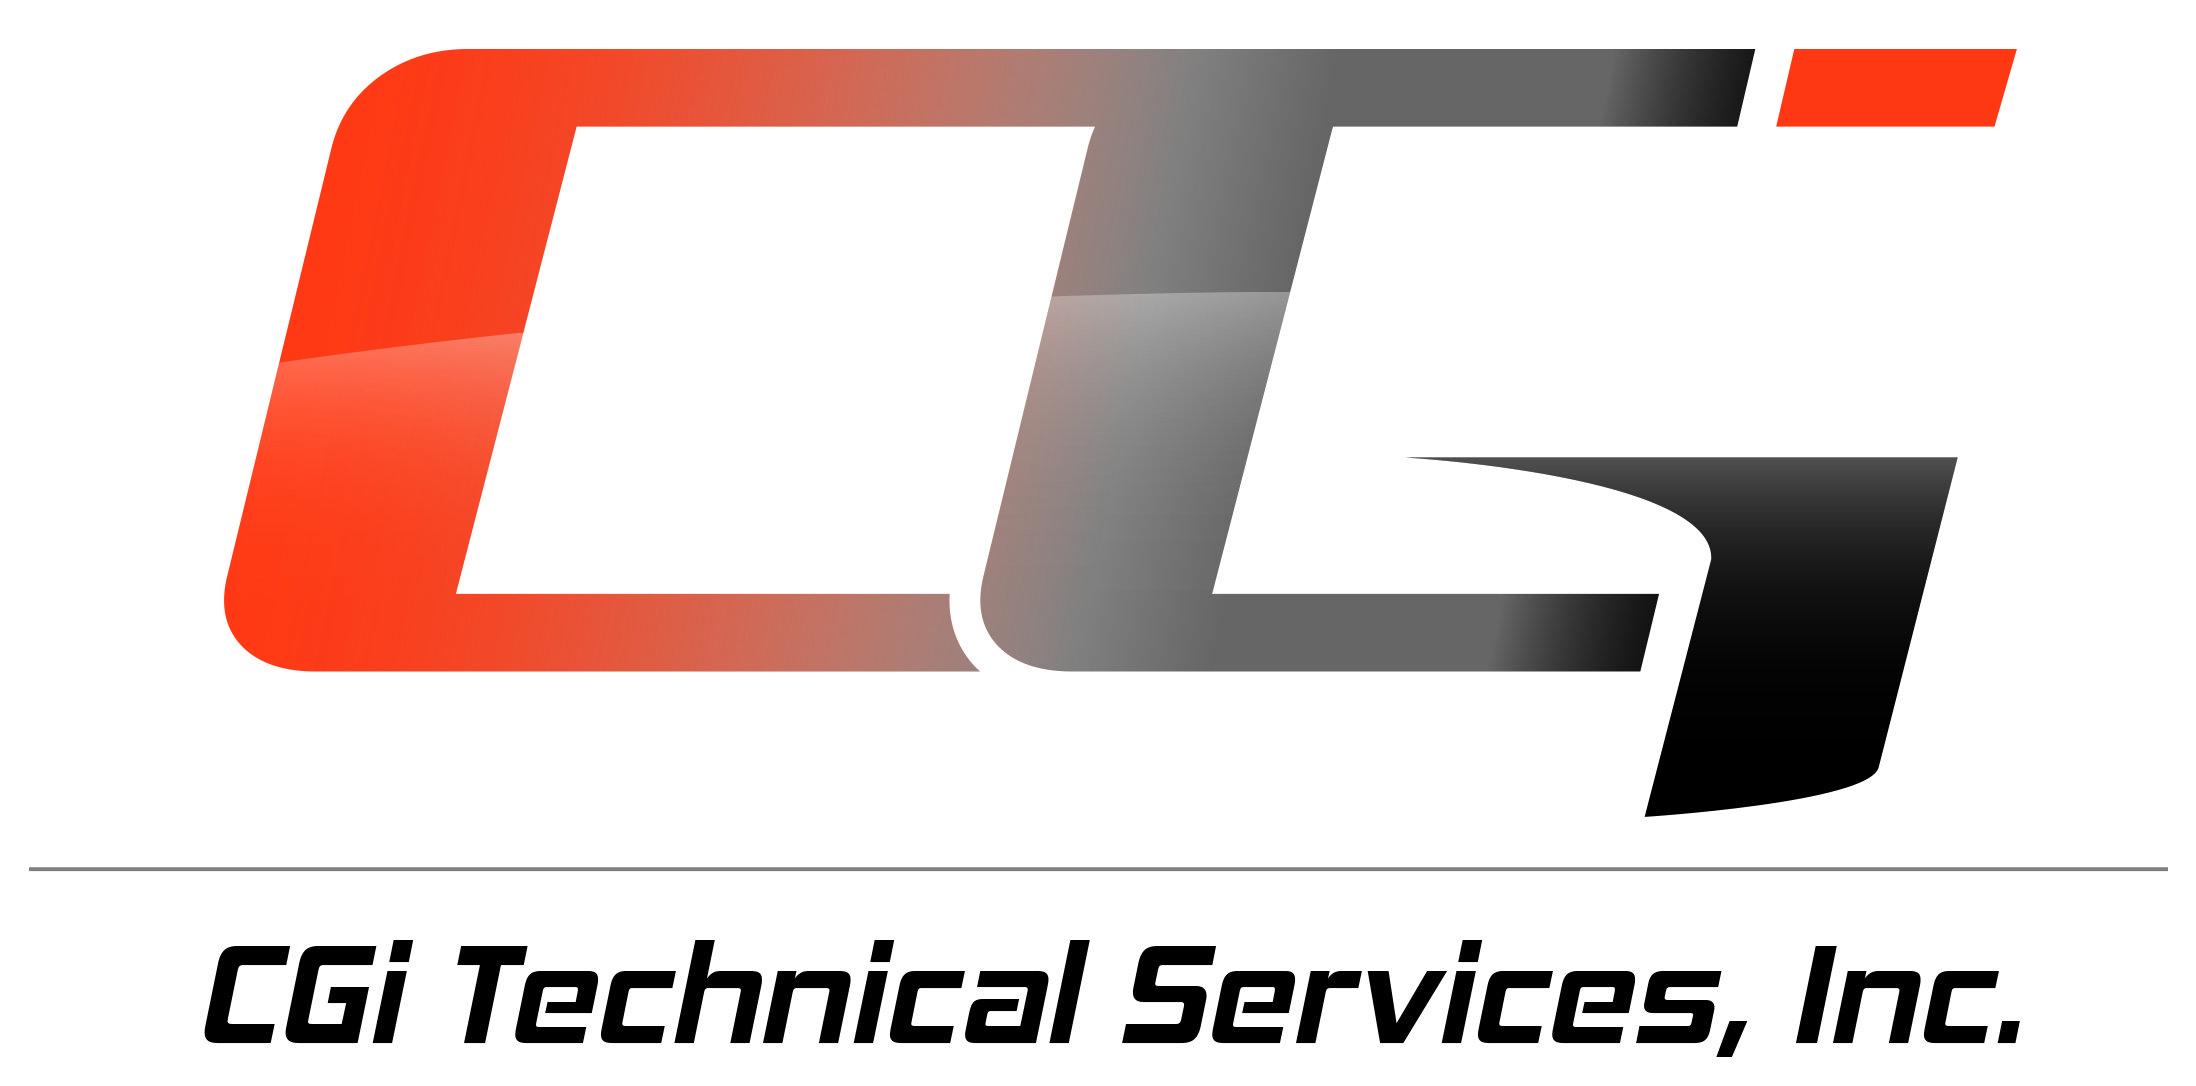 CGi Technical Services, Inc.